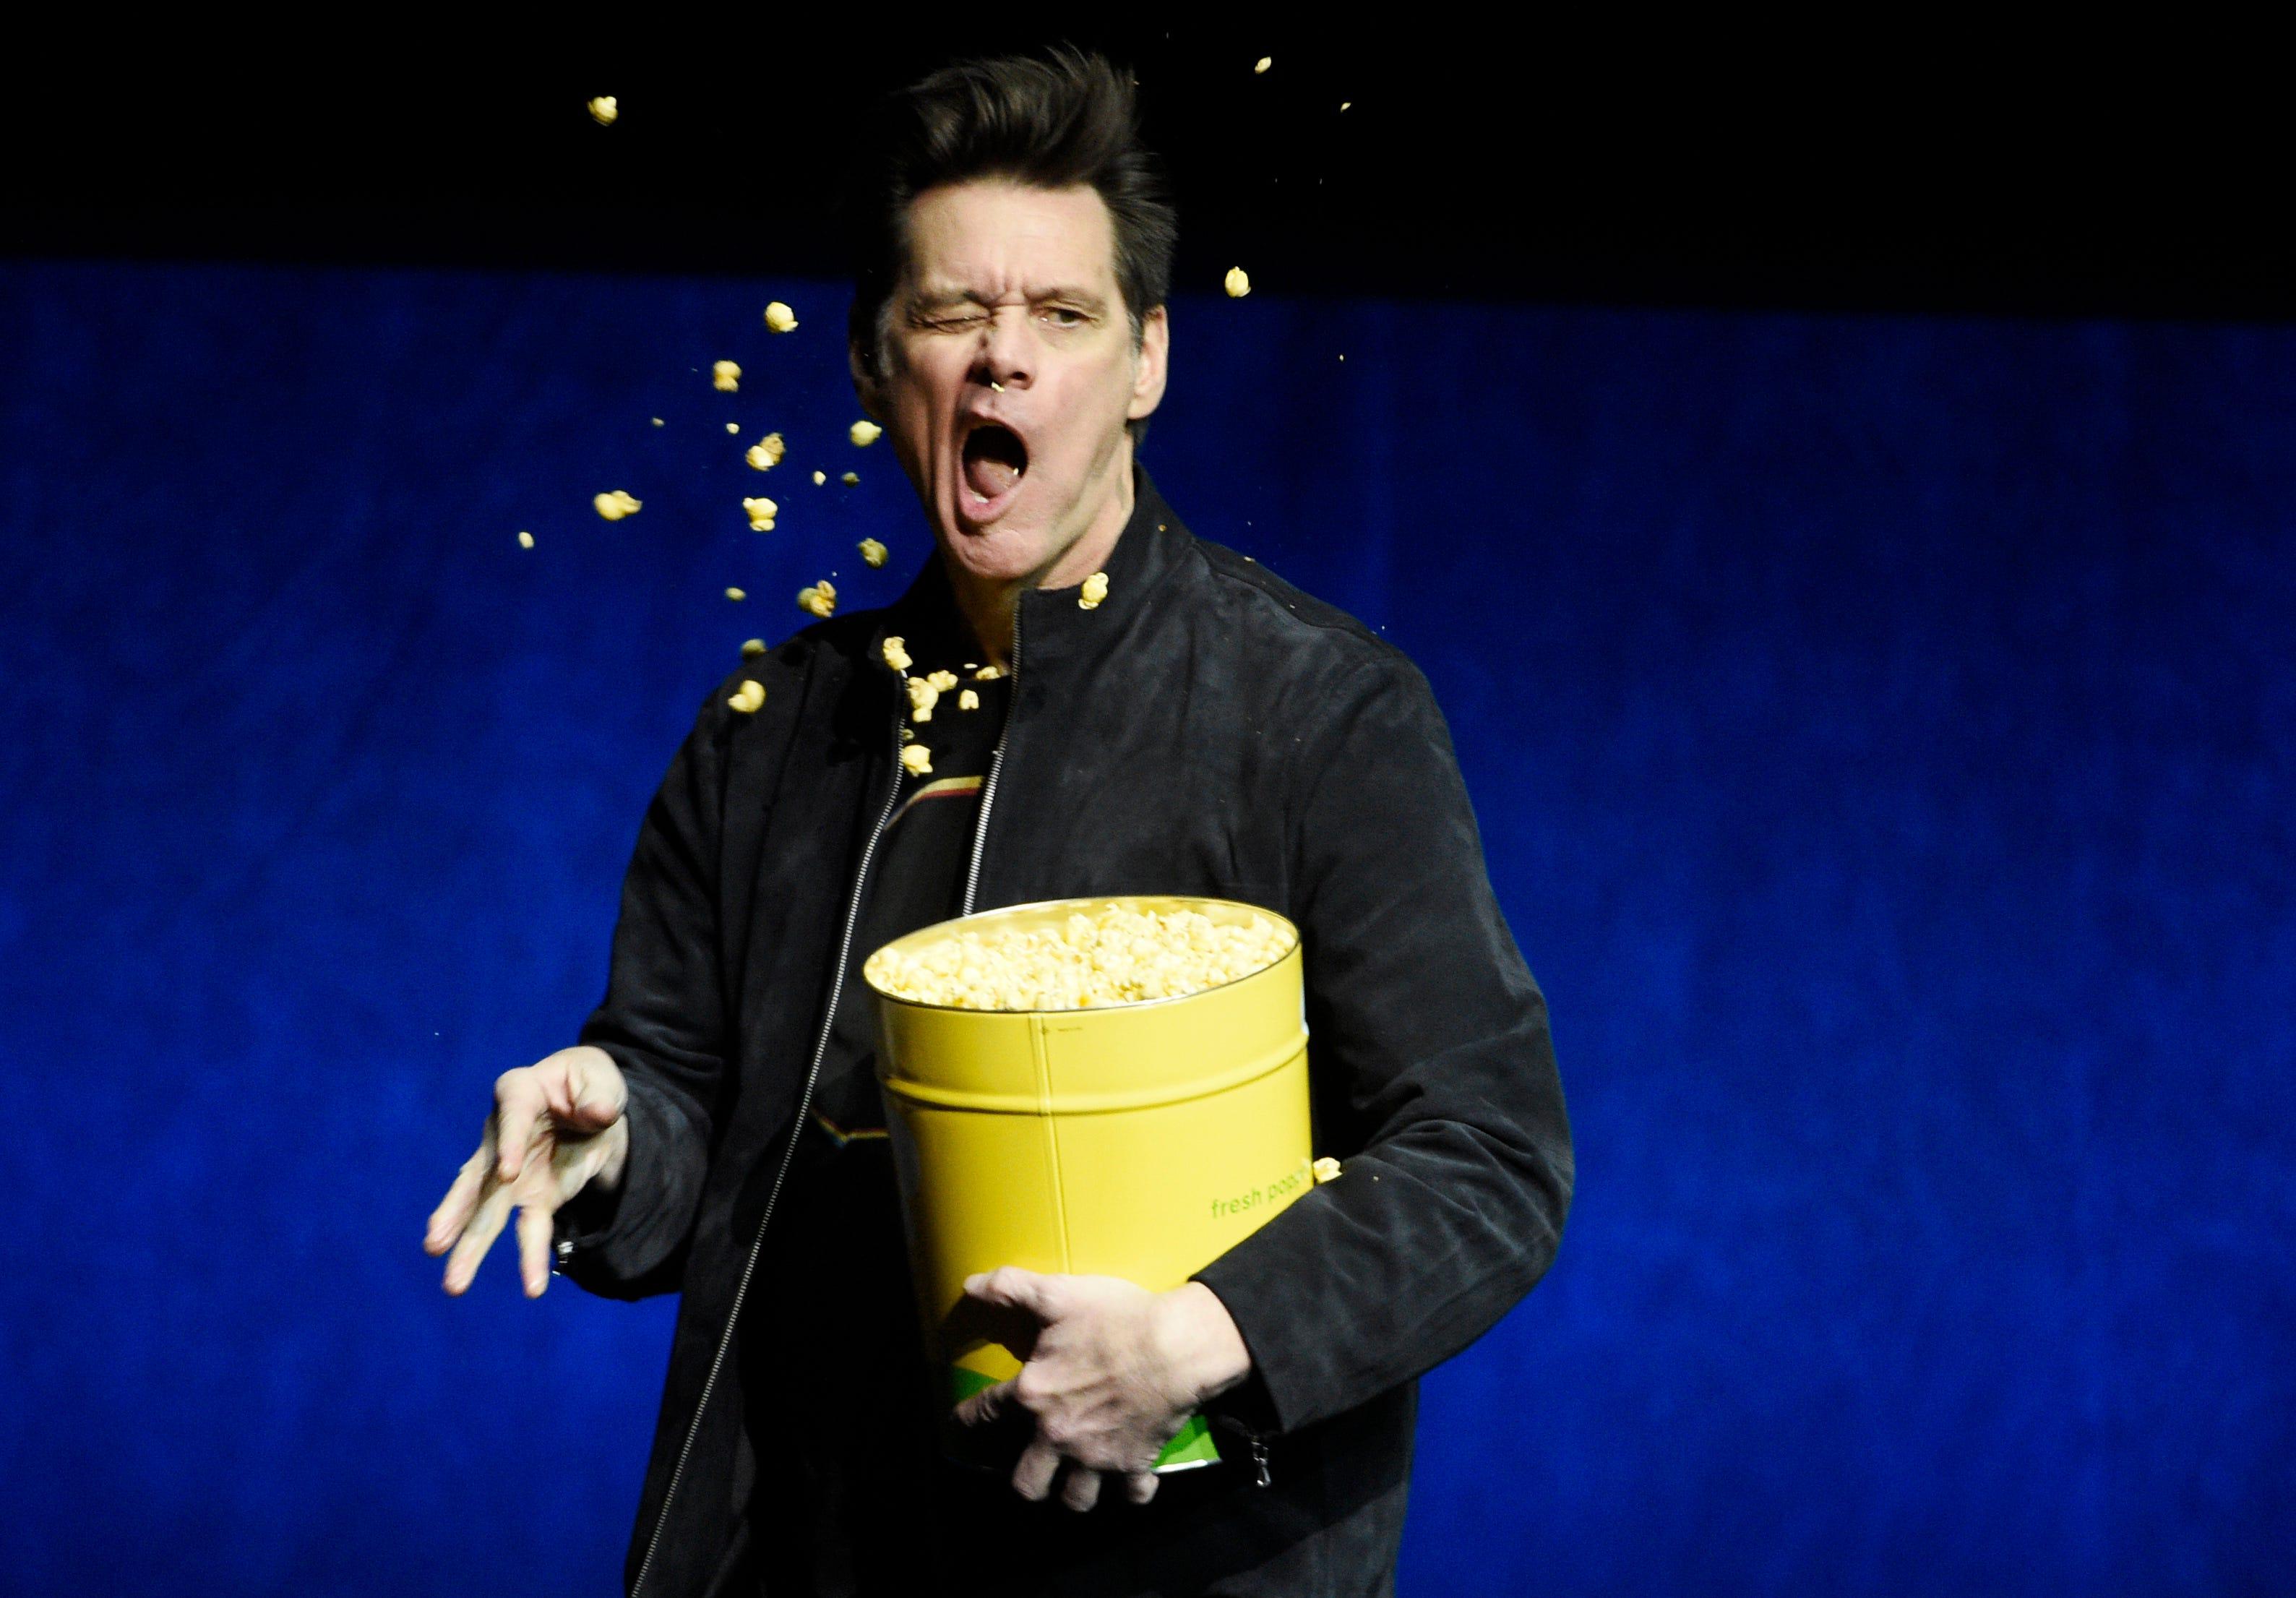 Jim Carrey retires from political cartoons now that Donald Trump ( Orange Julius Caesar ) is no longer president